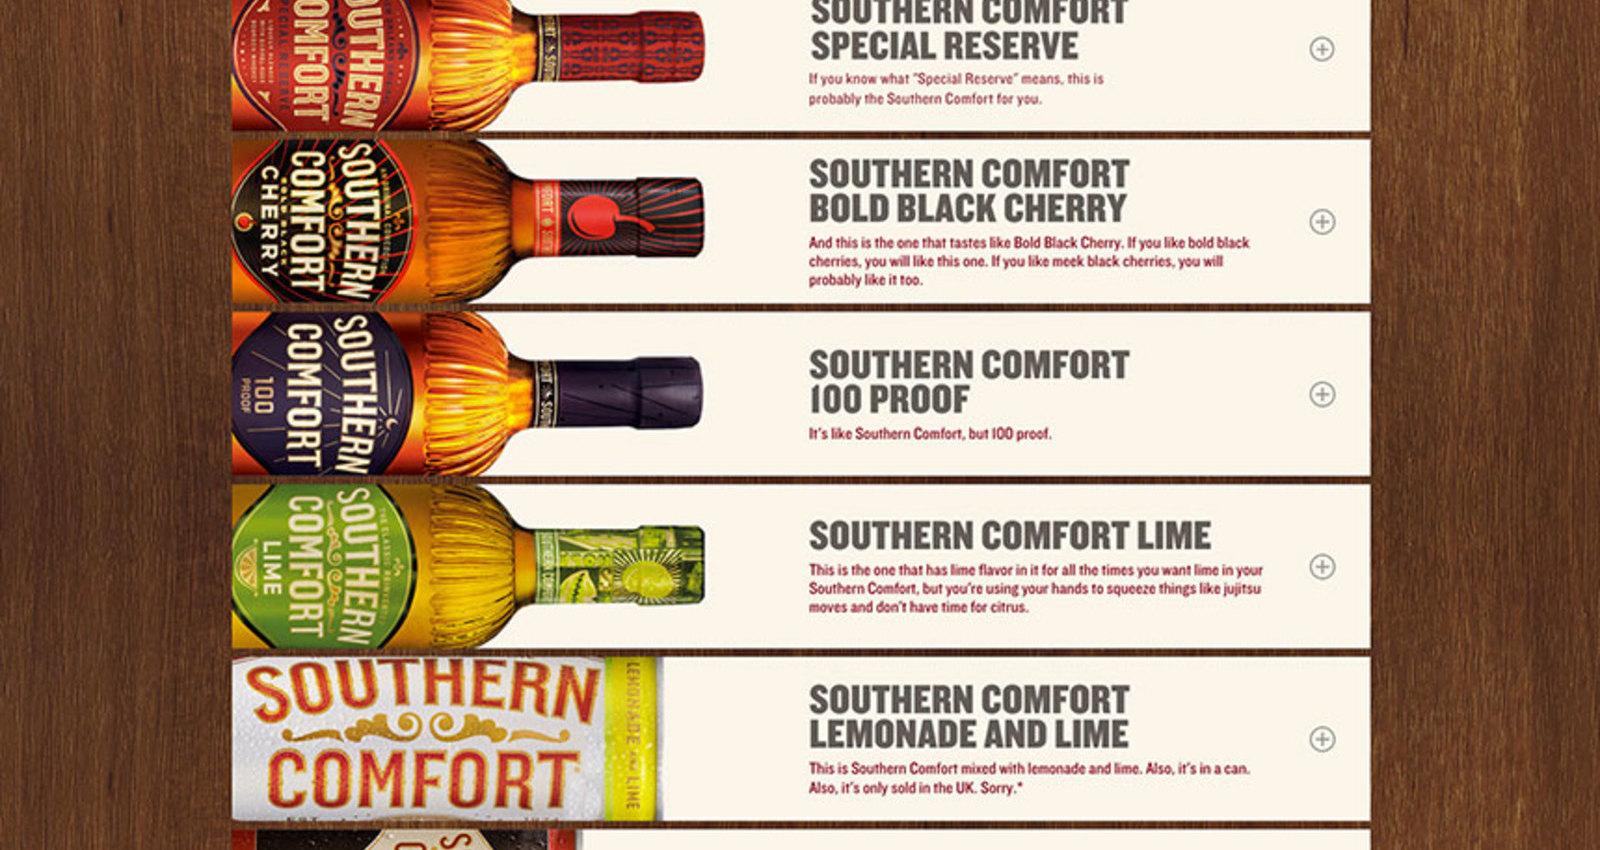 SouthernComfort.com